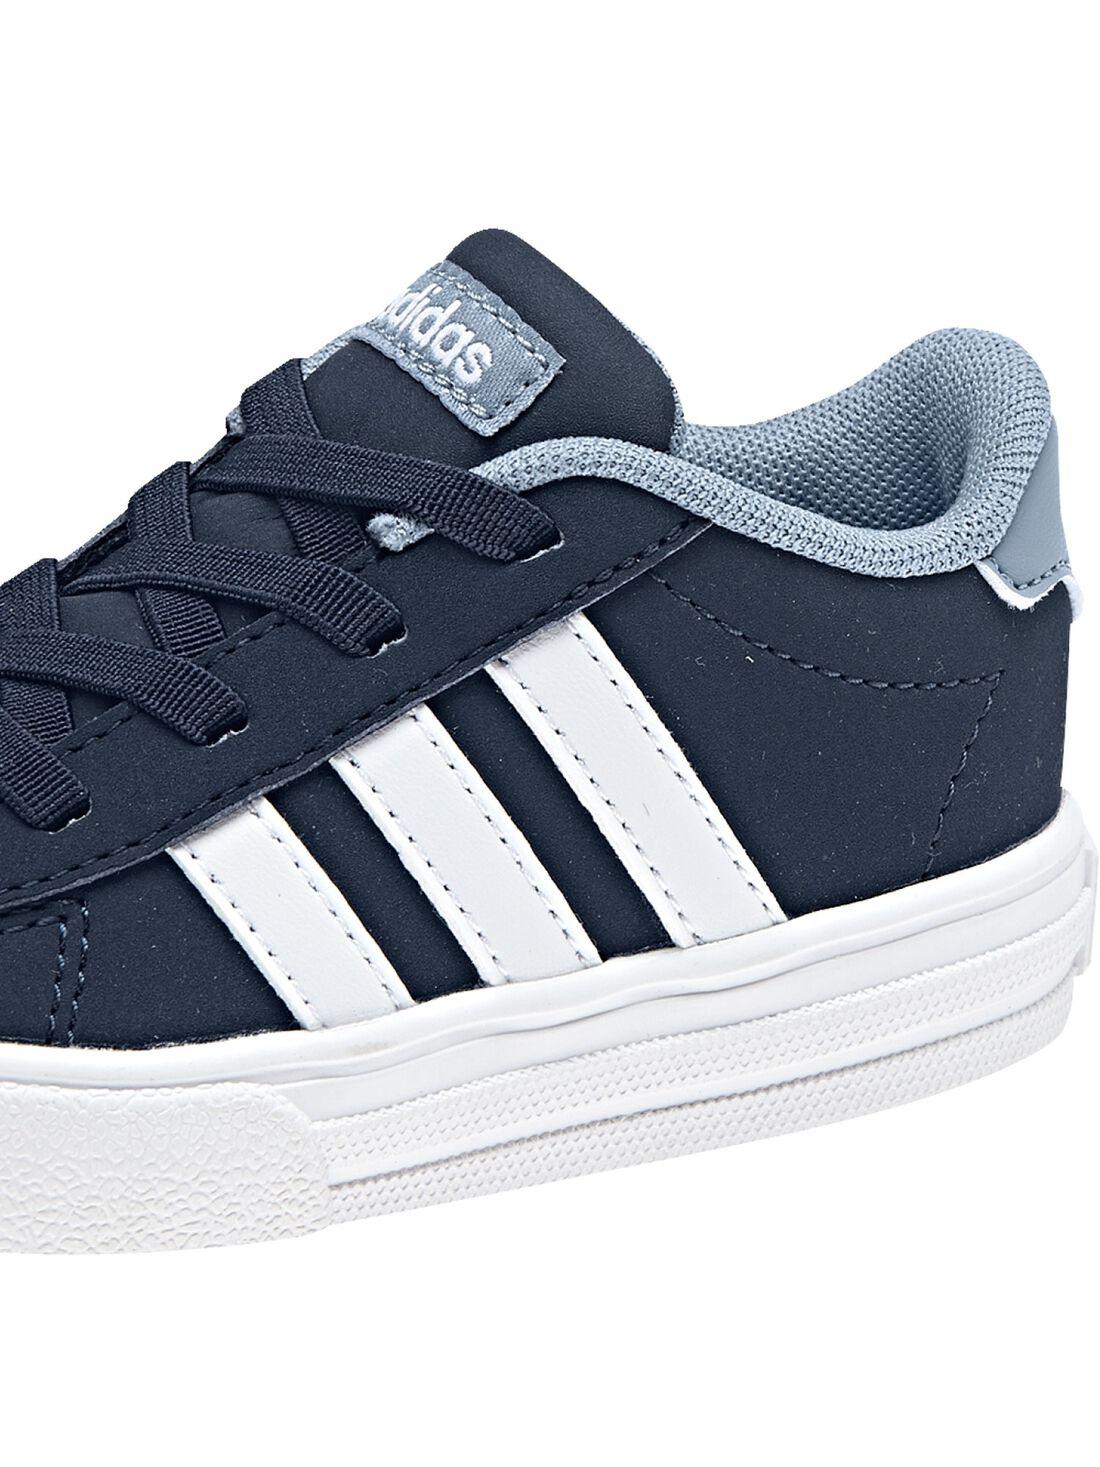 Baby boys' Adidas trainers